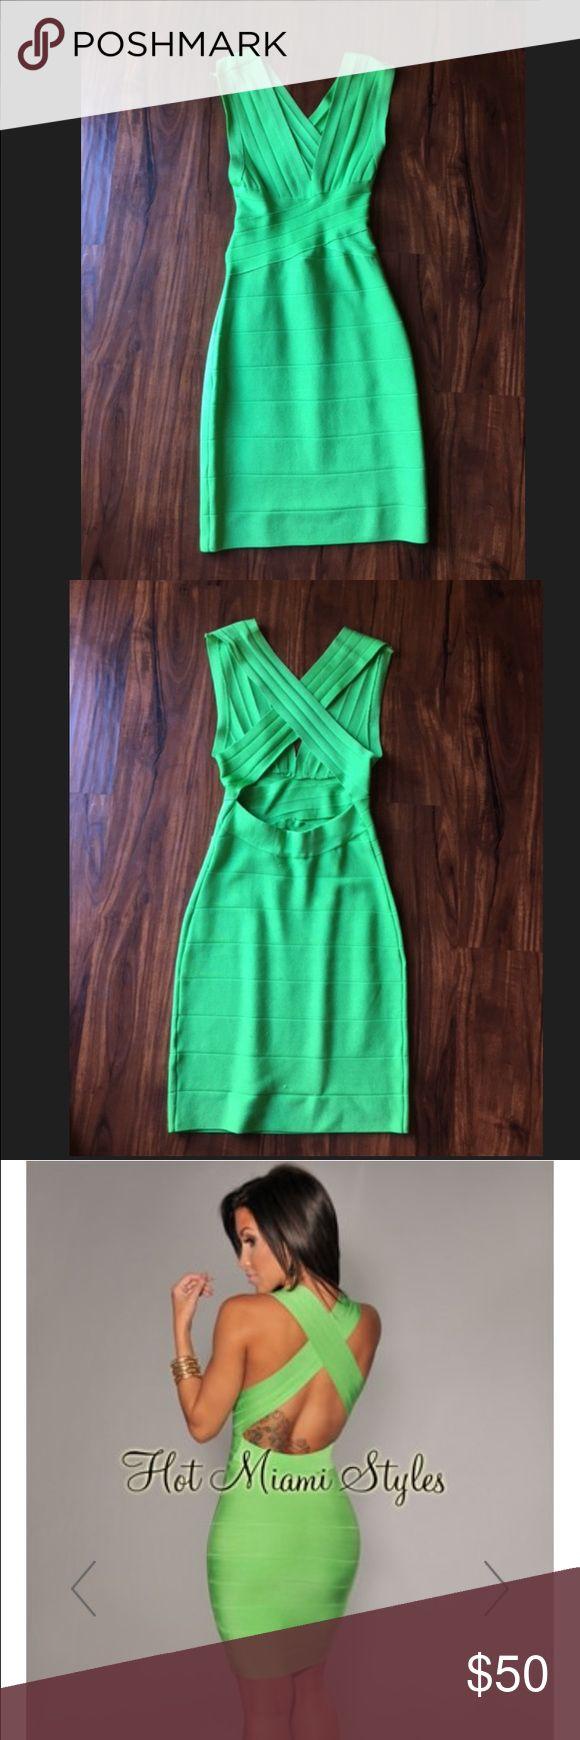 Hot Miami Styles Green Bandage Dress Hot Miami Styles Green Bandage Dress Size: S Worn once Dresses Mini